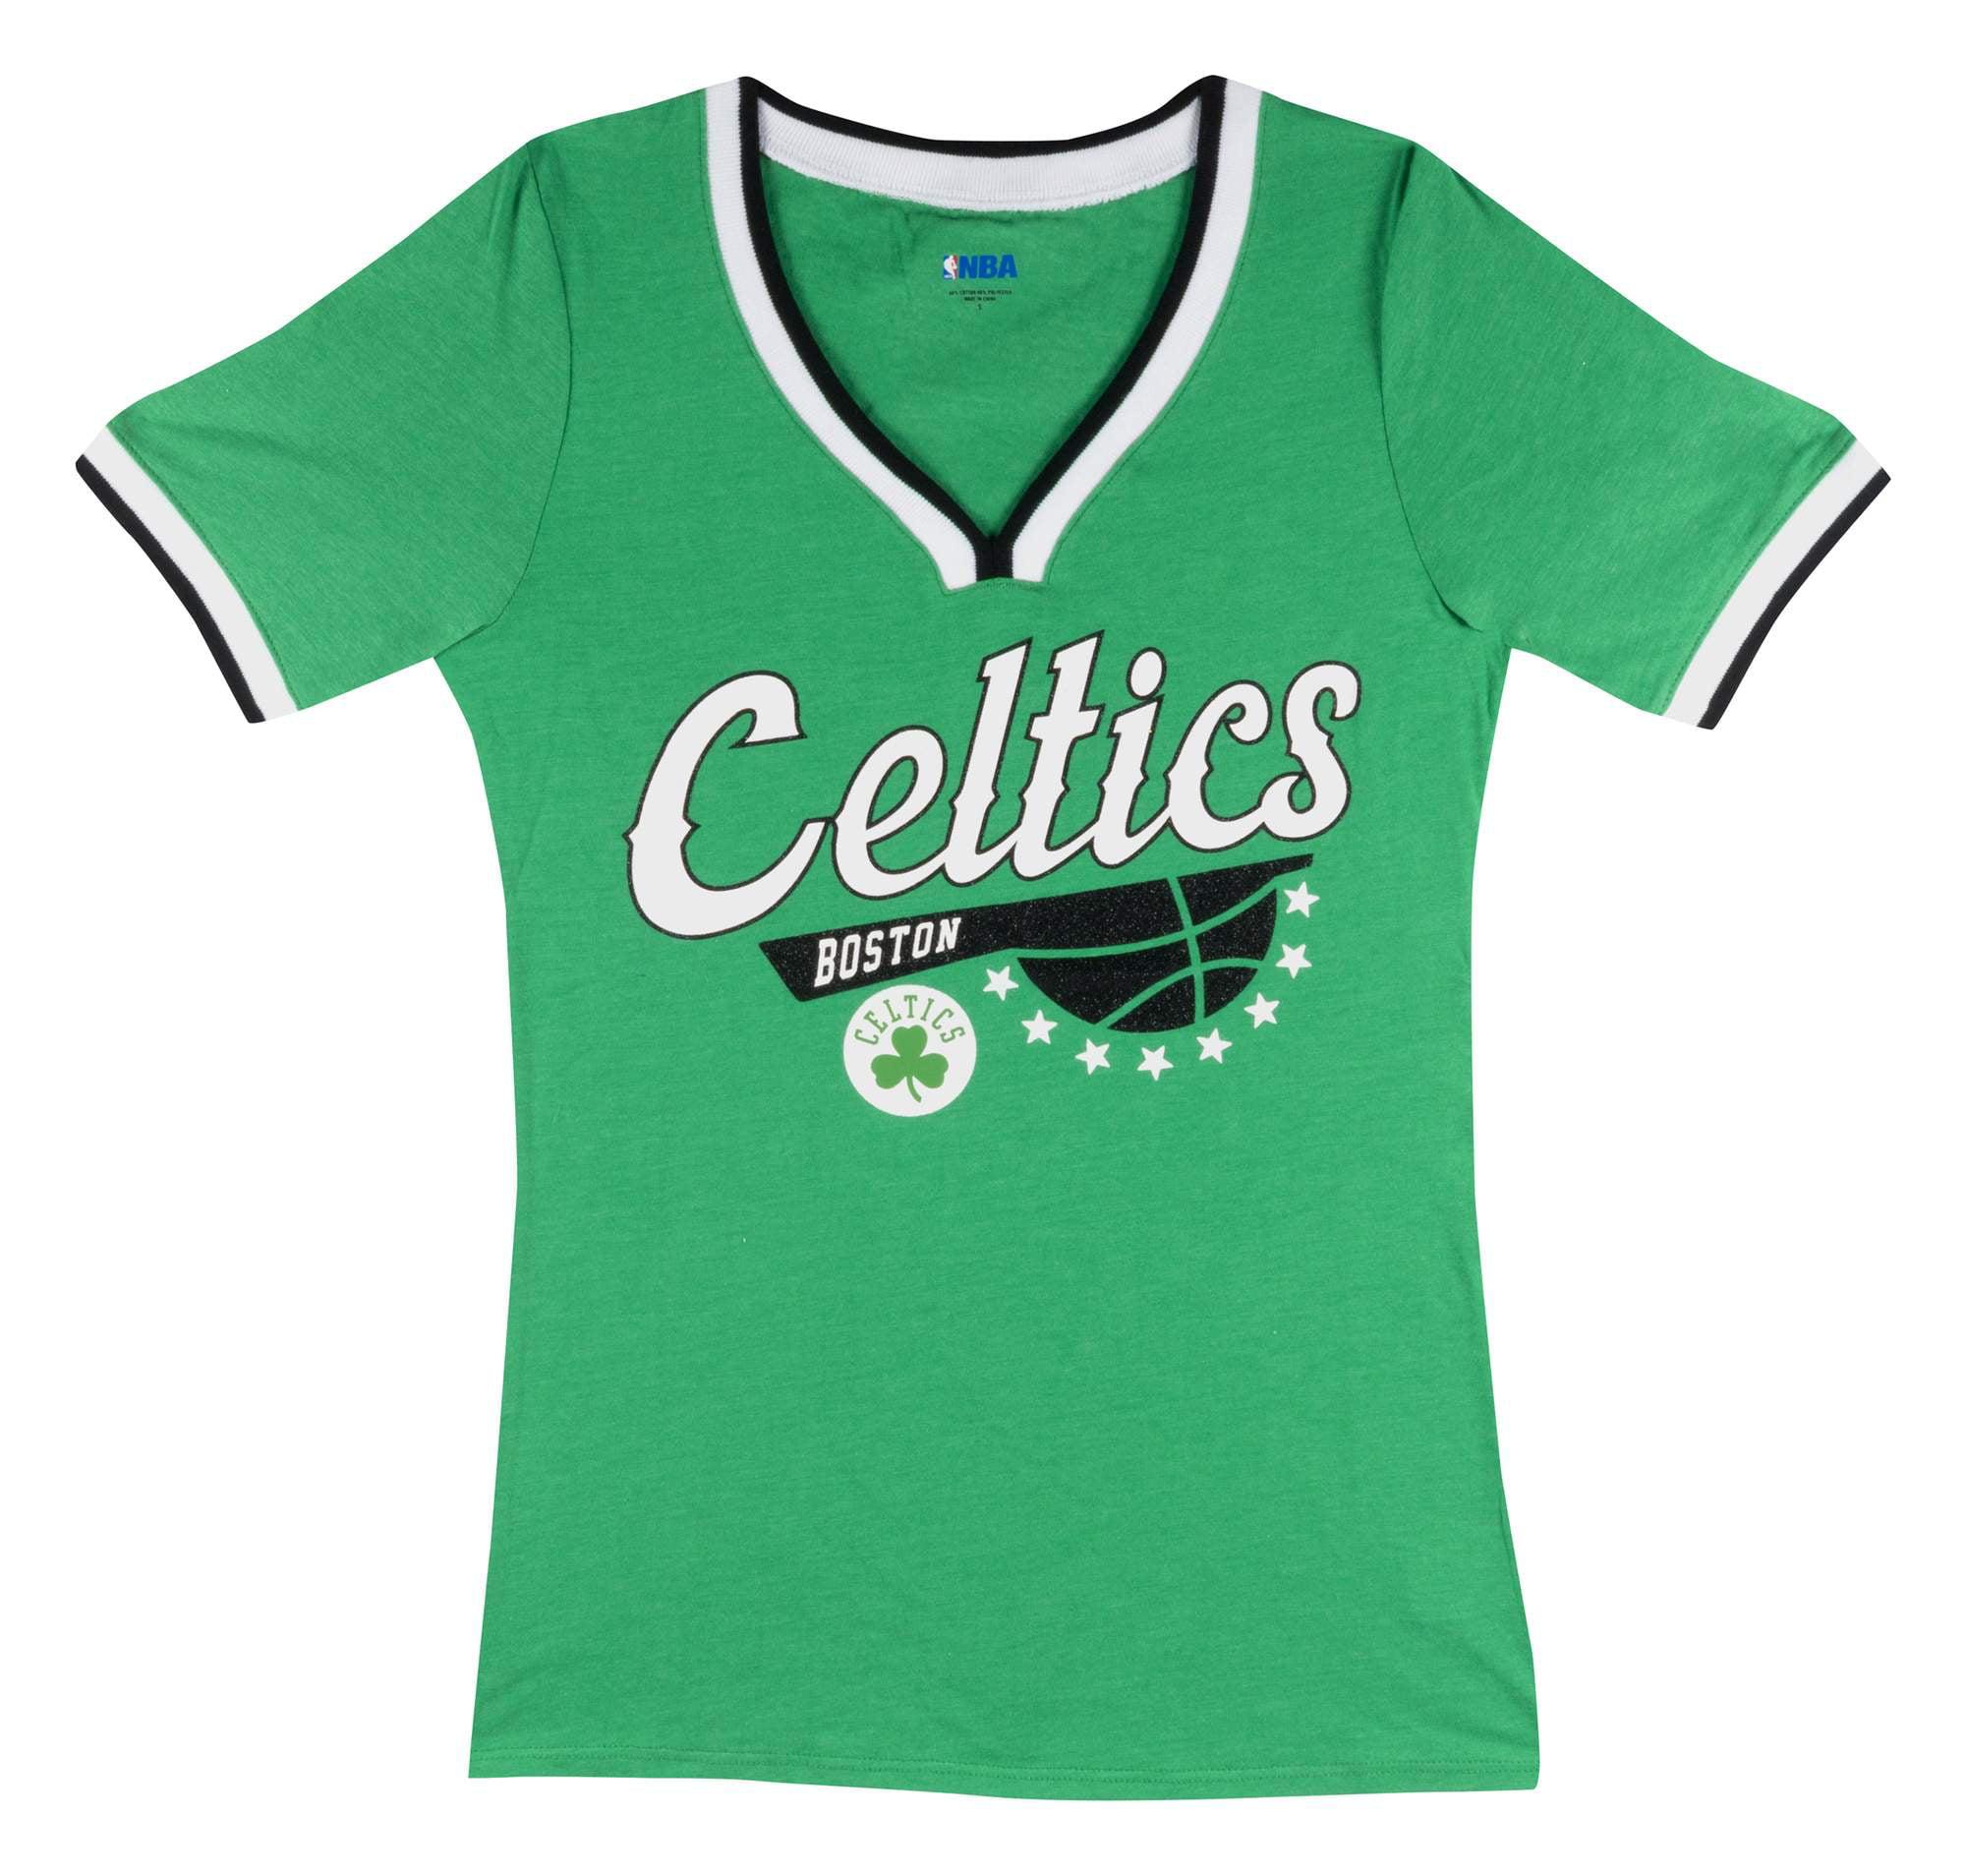 Boston Celtics Women's NBA Short Sleeve Biblend V Notch Scoop Neck Tee